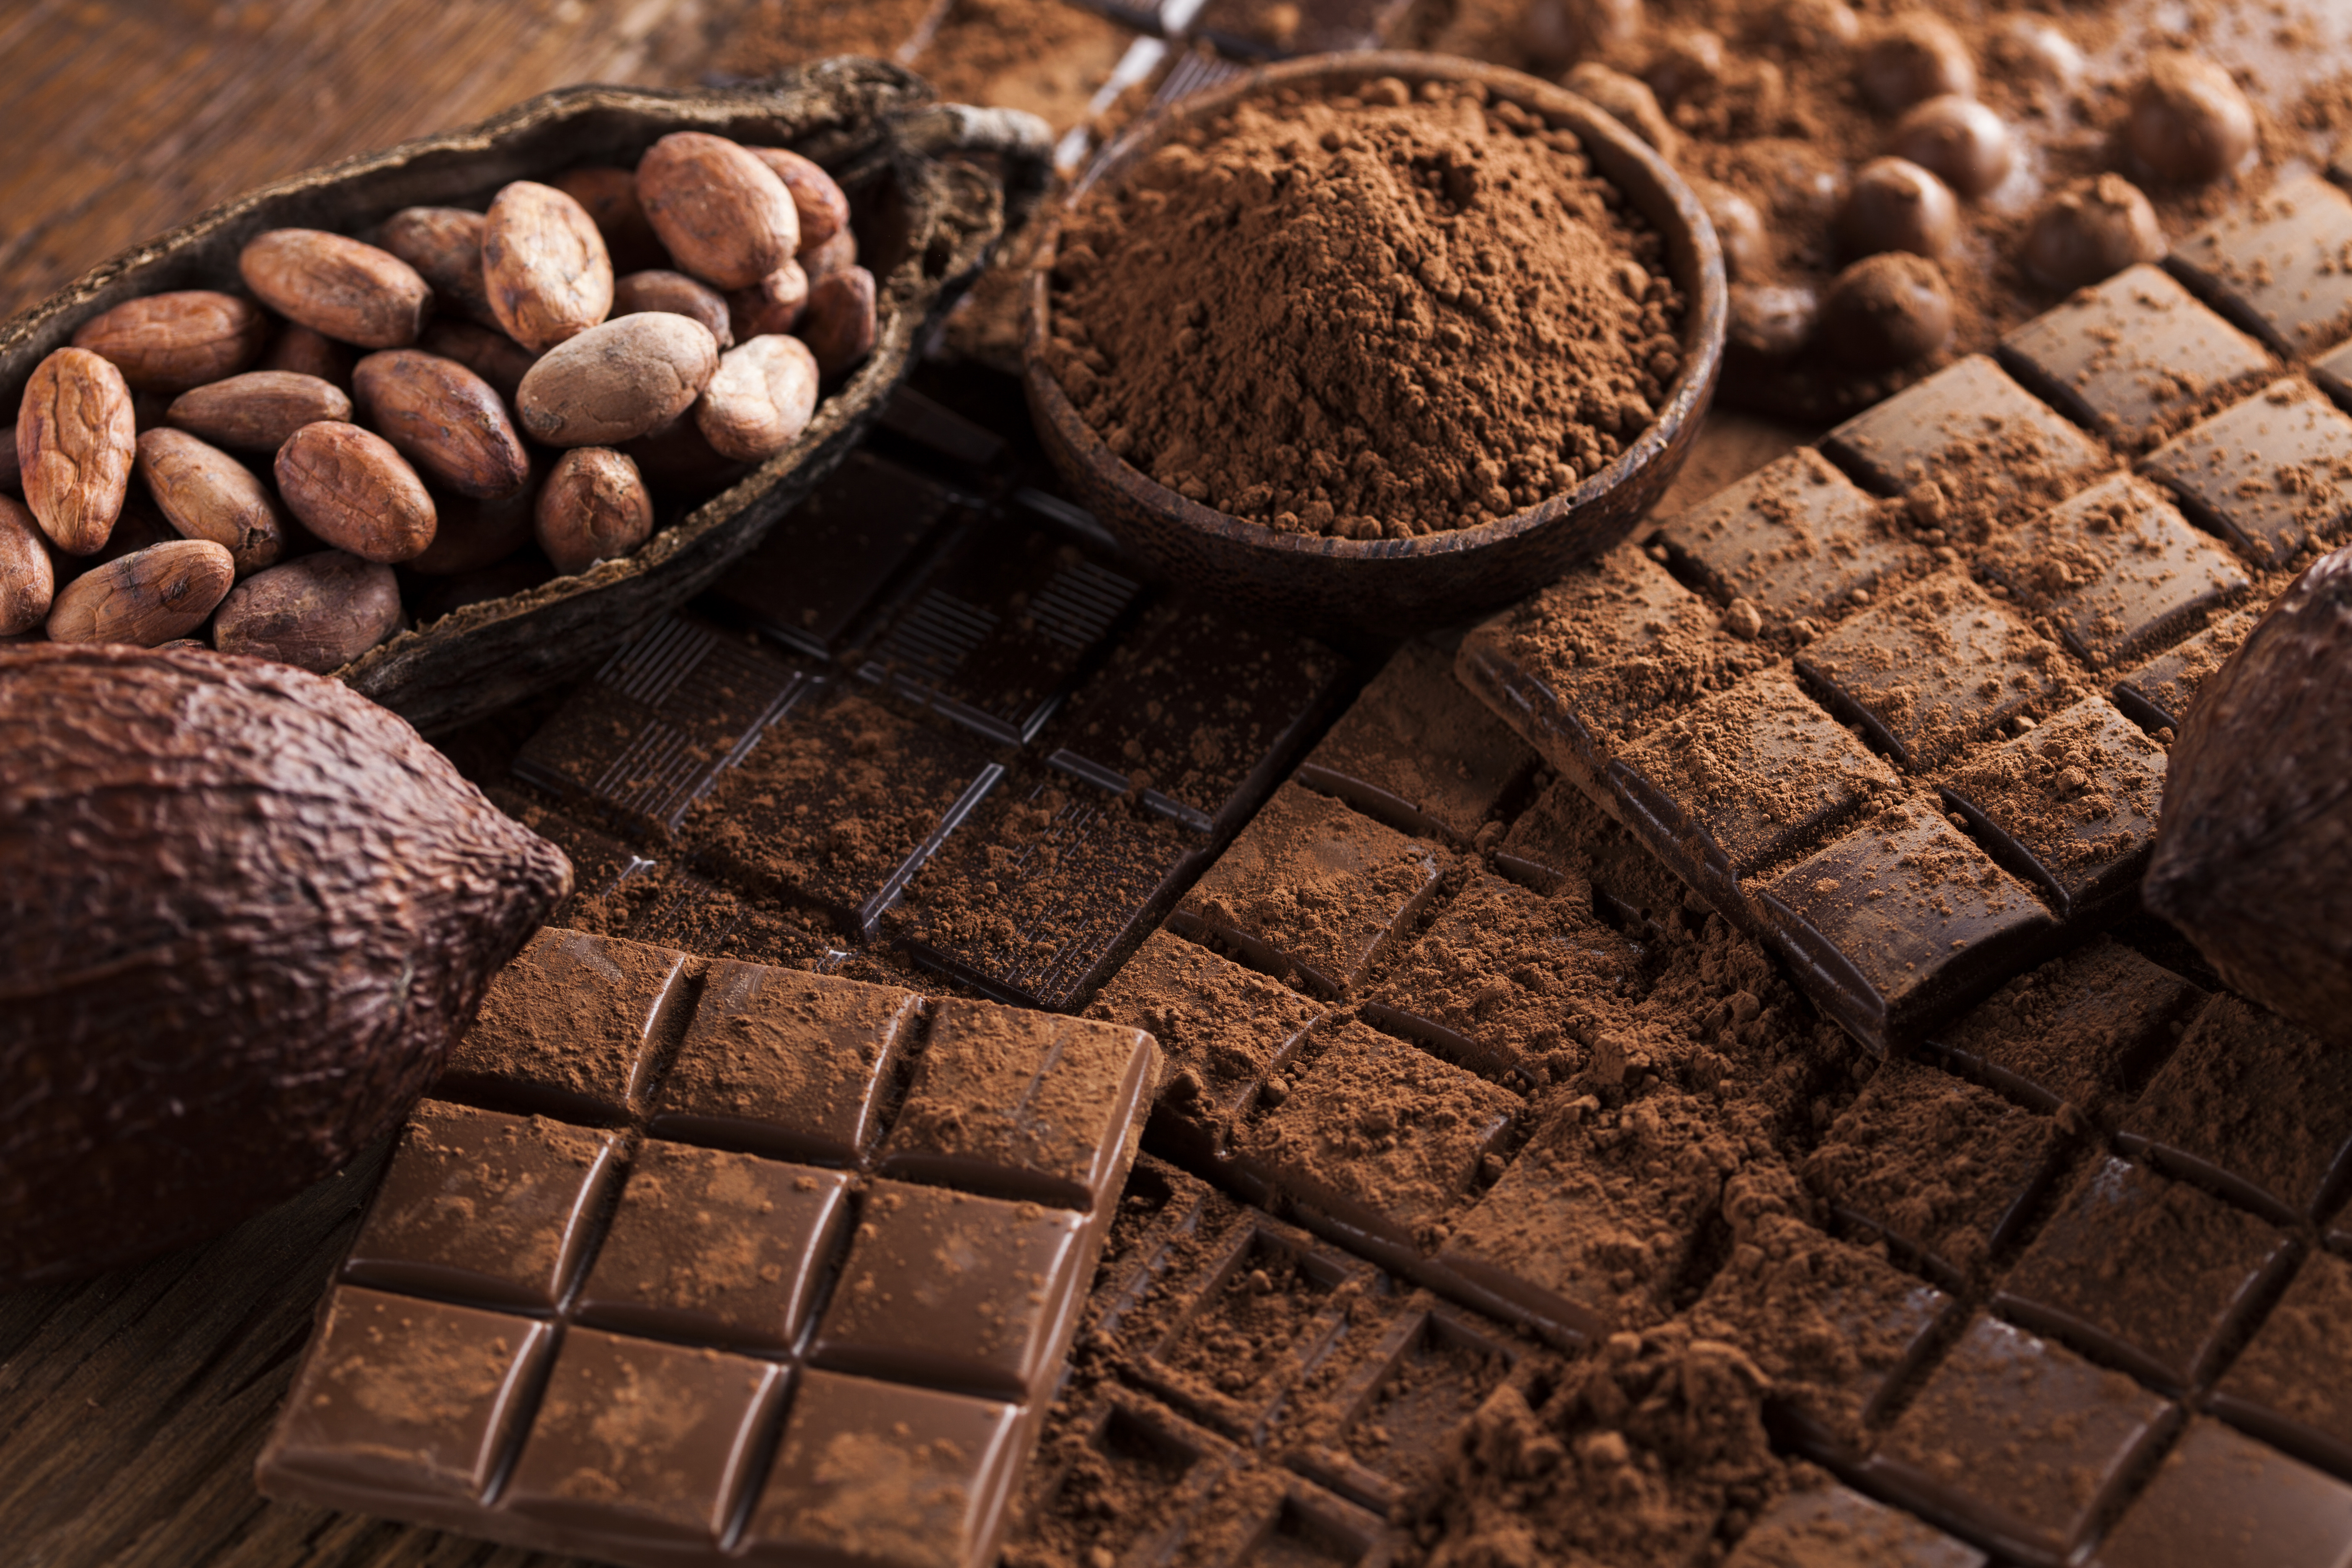 Fondos De Pantalla De Chocolates: Schokolade 5k Retina Ultra HD Wallpaper